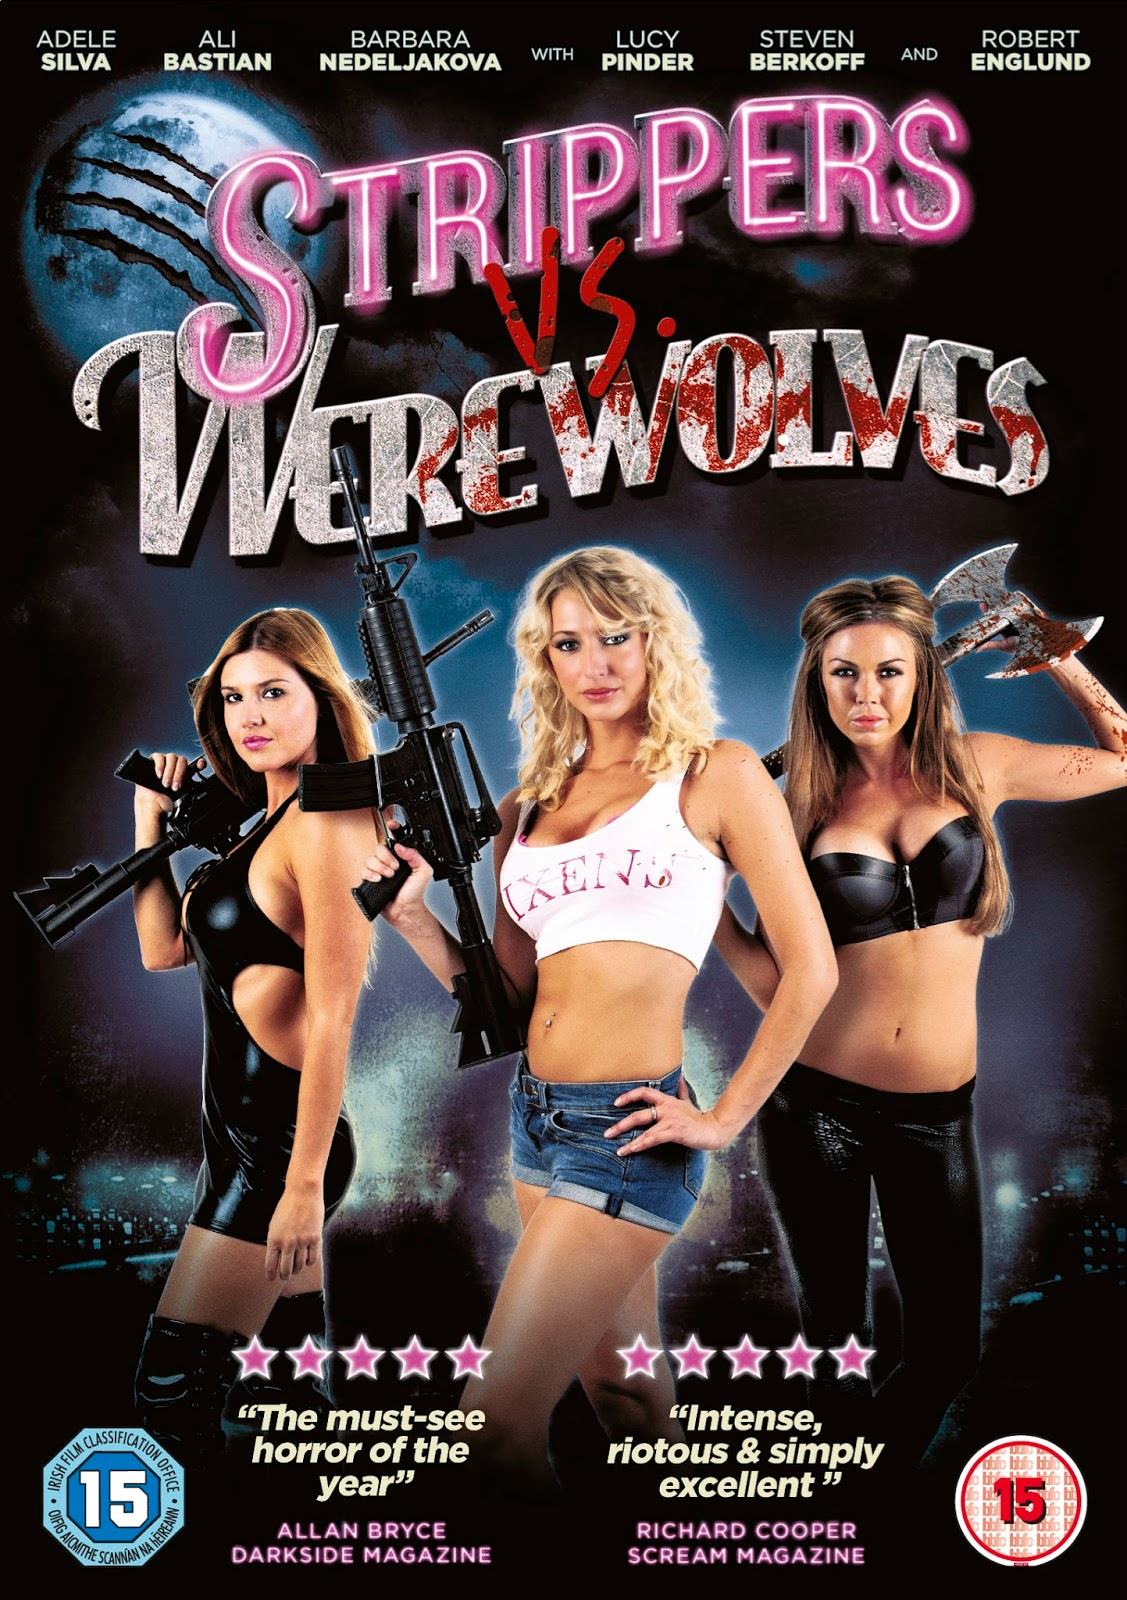 Strippers VS. Werewolves สวยระห่ำ ปะทะ มนุษย์หมาป่า [HD][พากย์ไทย]